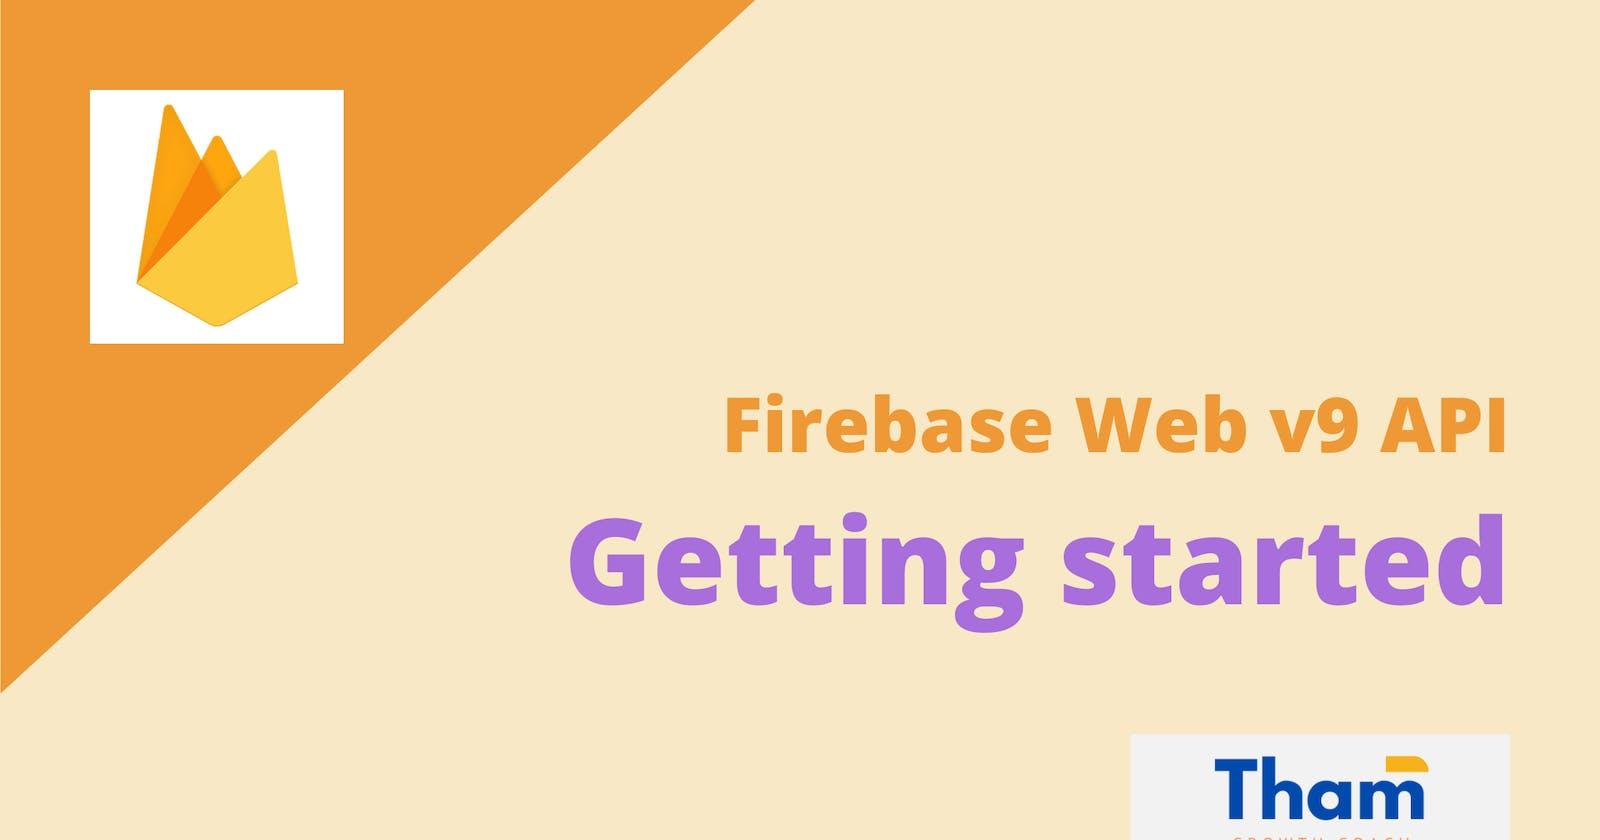 Getting started with Firebase web v9 API